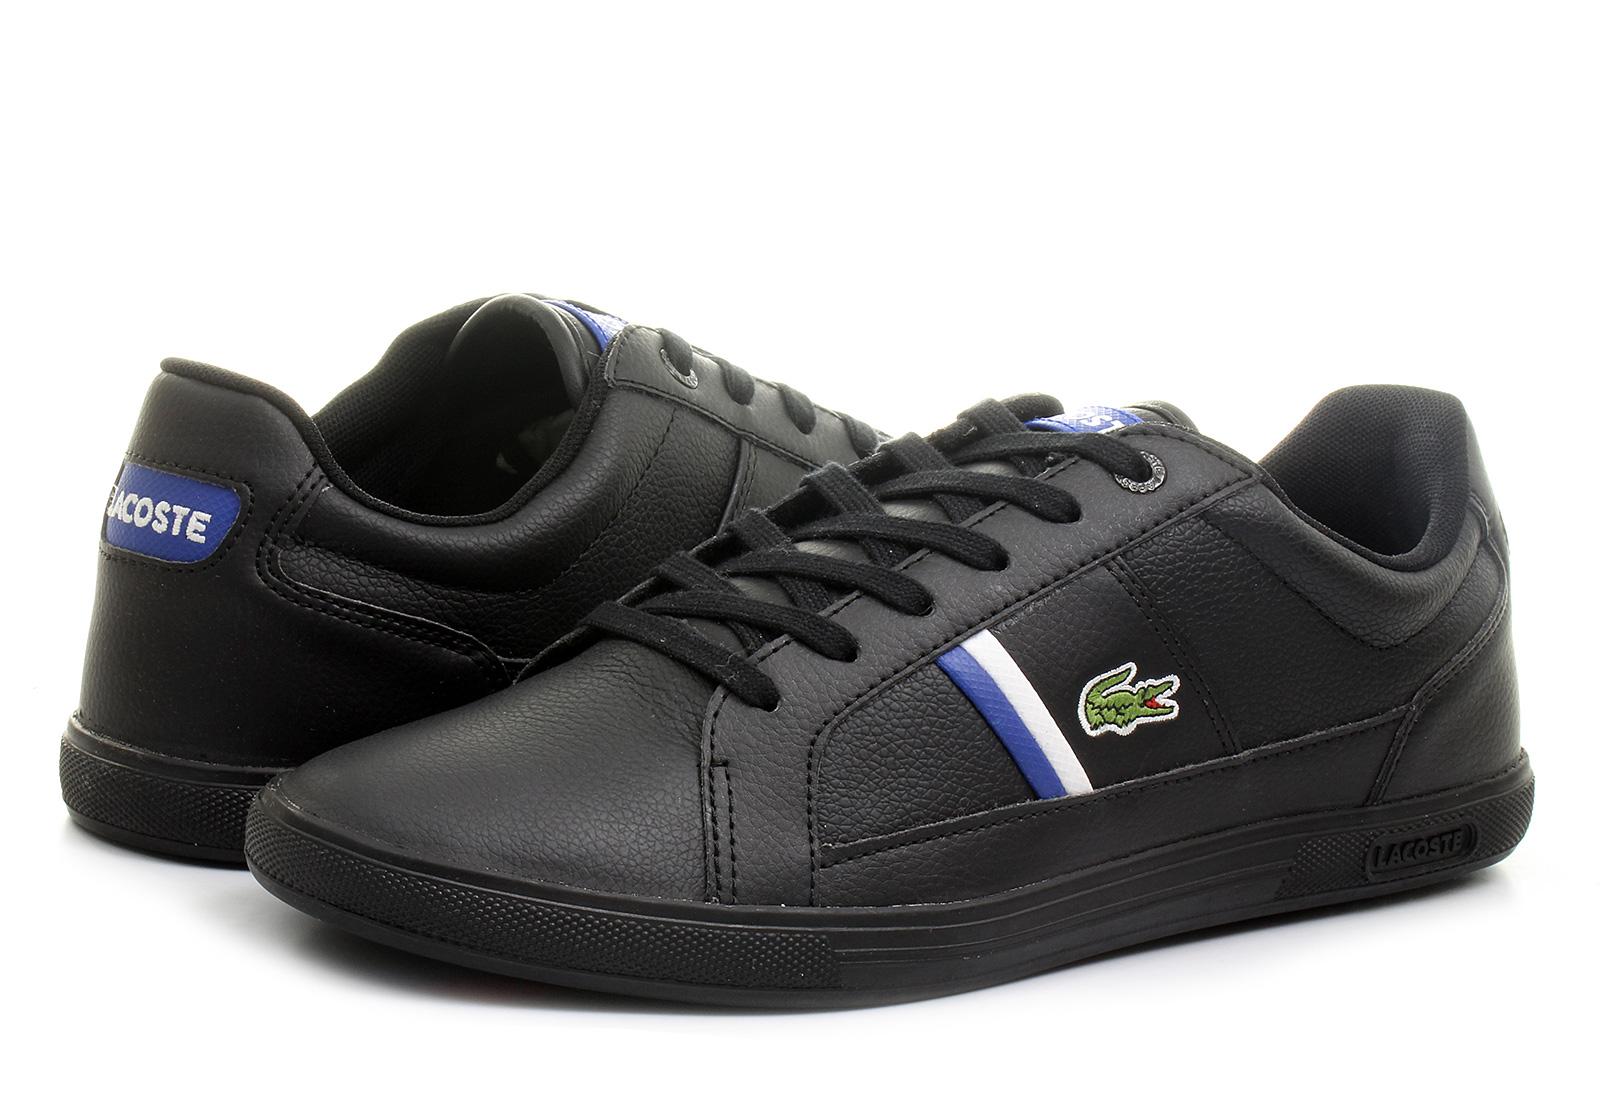 Lacoste Cipő - Europa - 153spm0008-02h - Office Shoes Magyarország f45b9e07ee